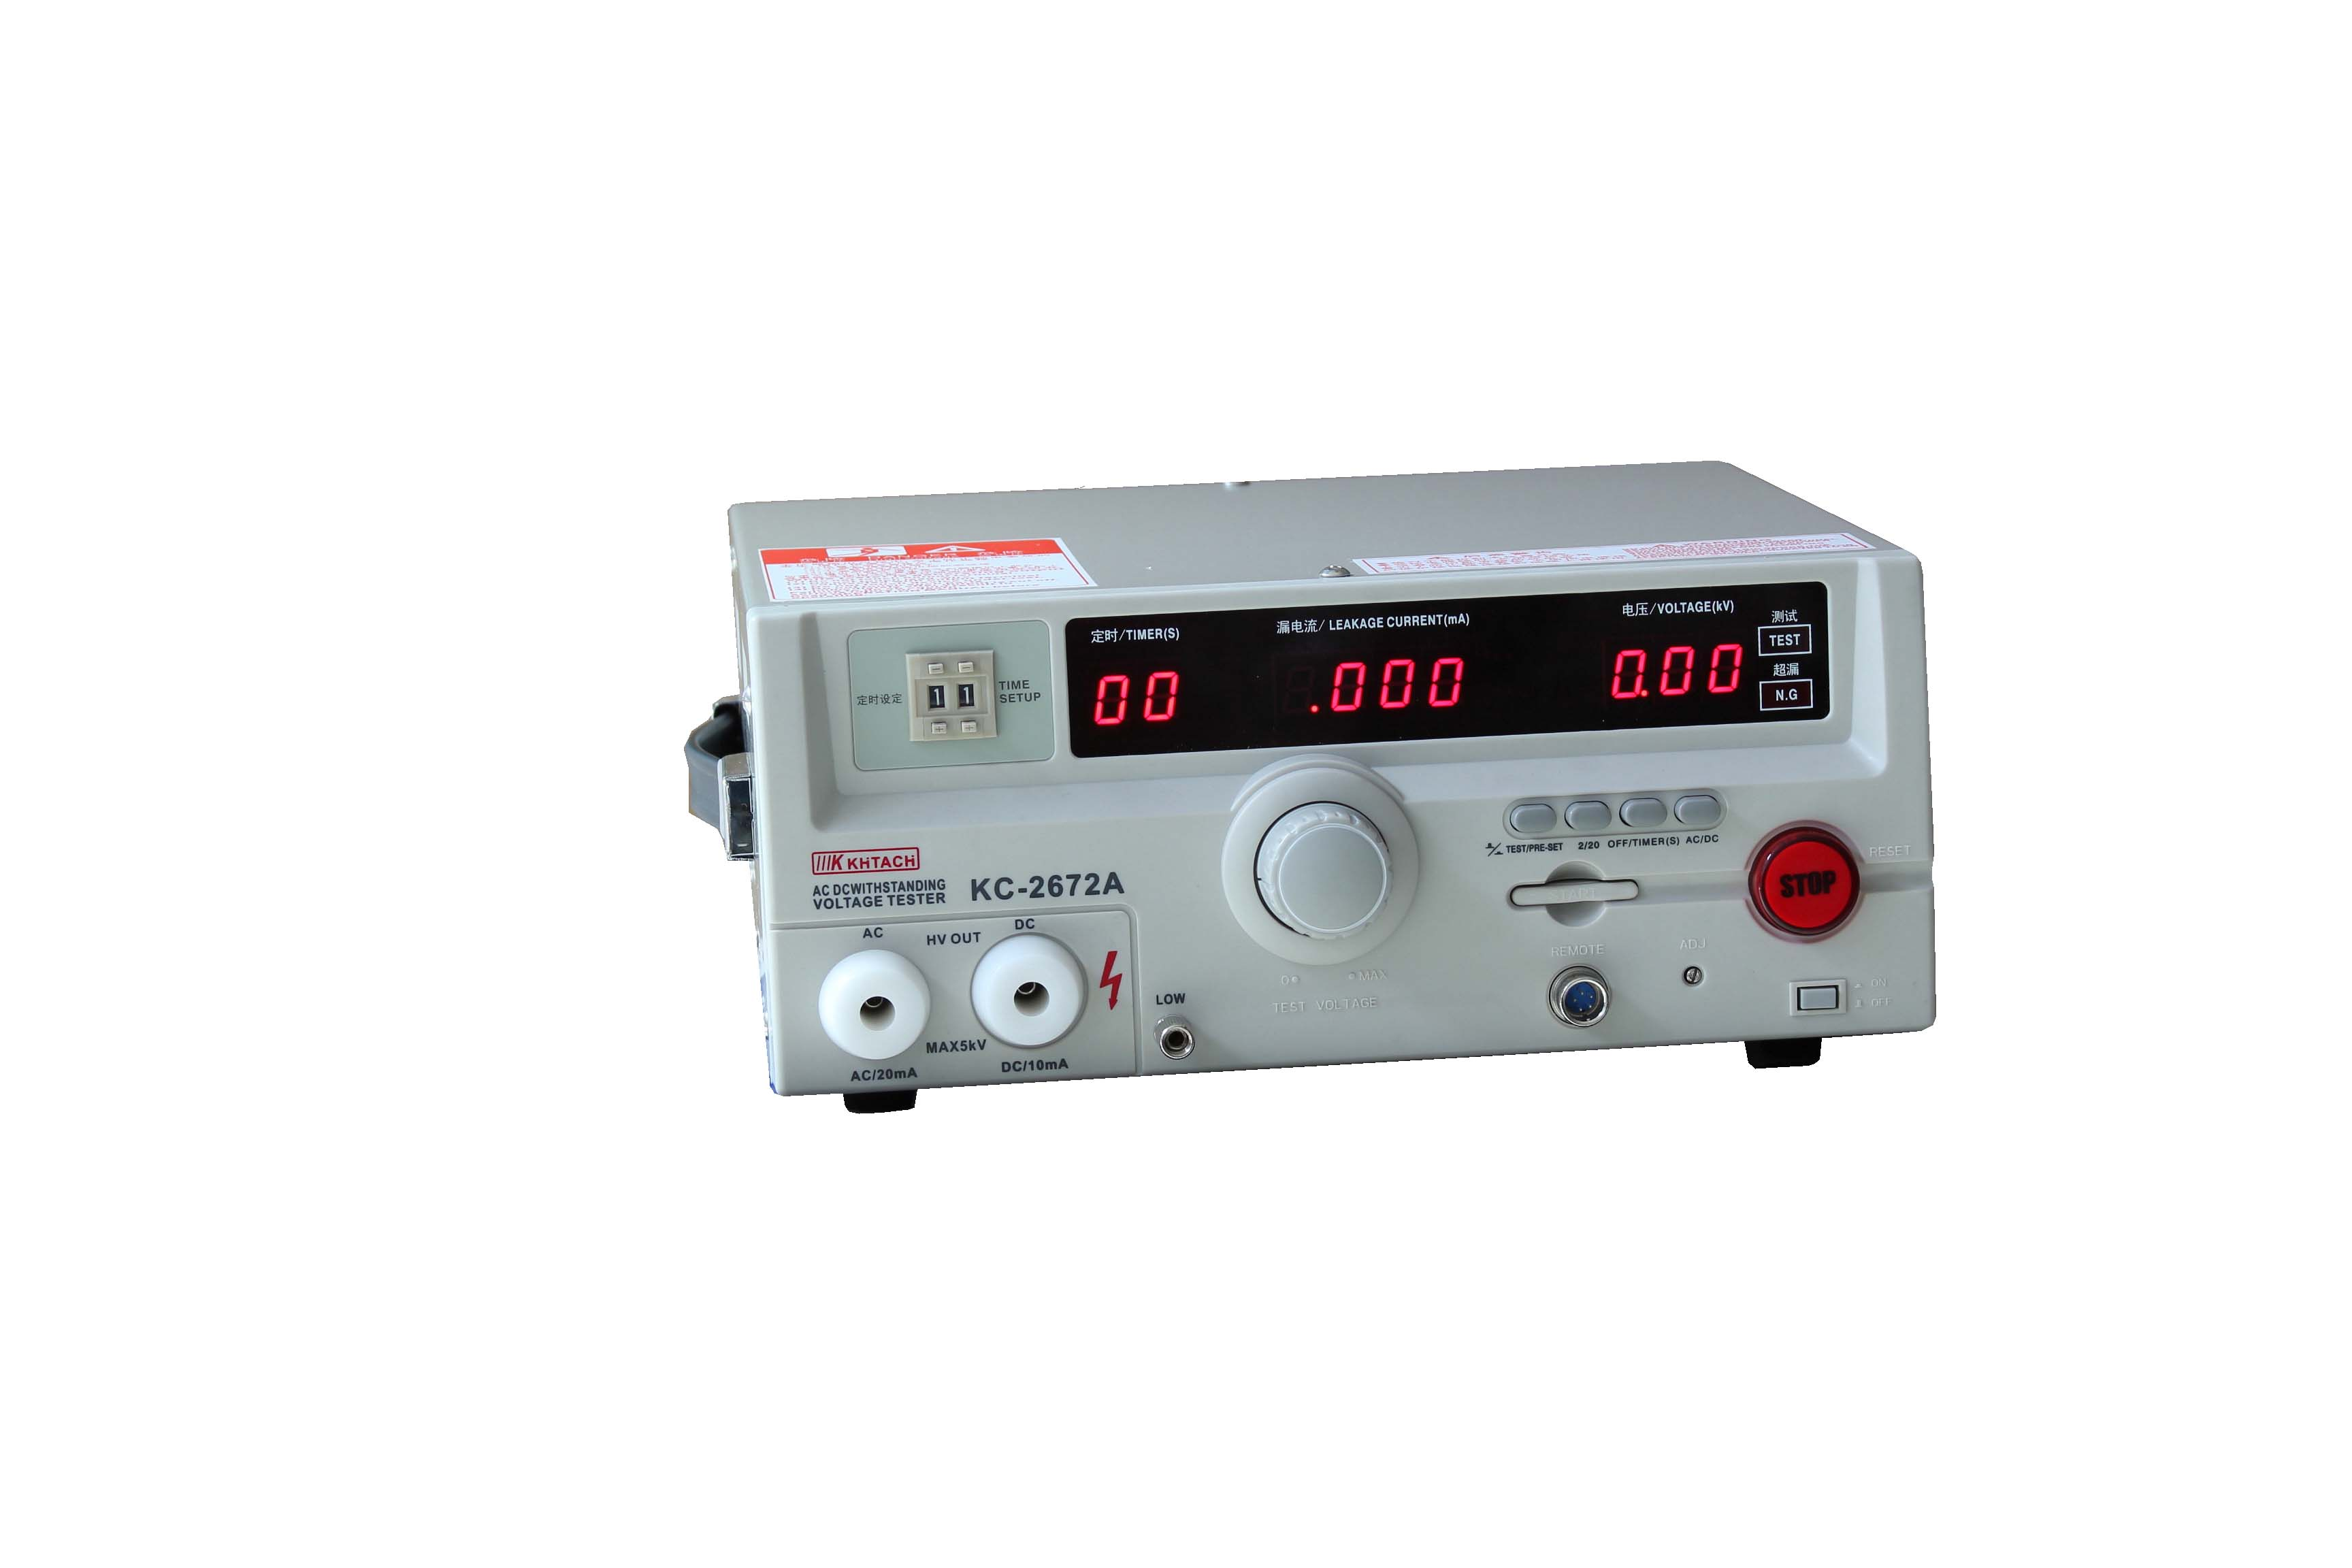 KC系列耐压测试仪 高压仪 其他电工仪器仪表批发,采购,供应 华南城